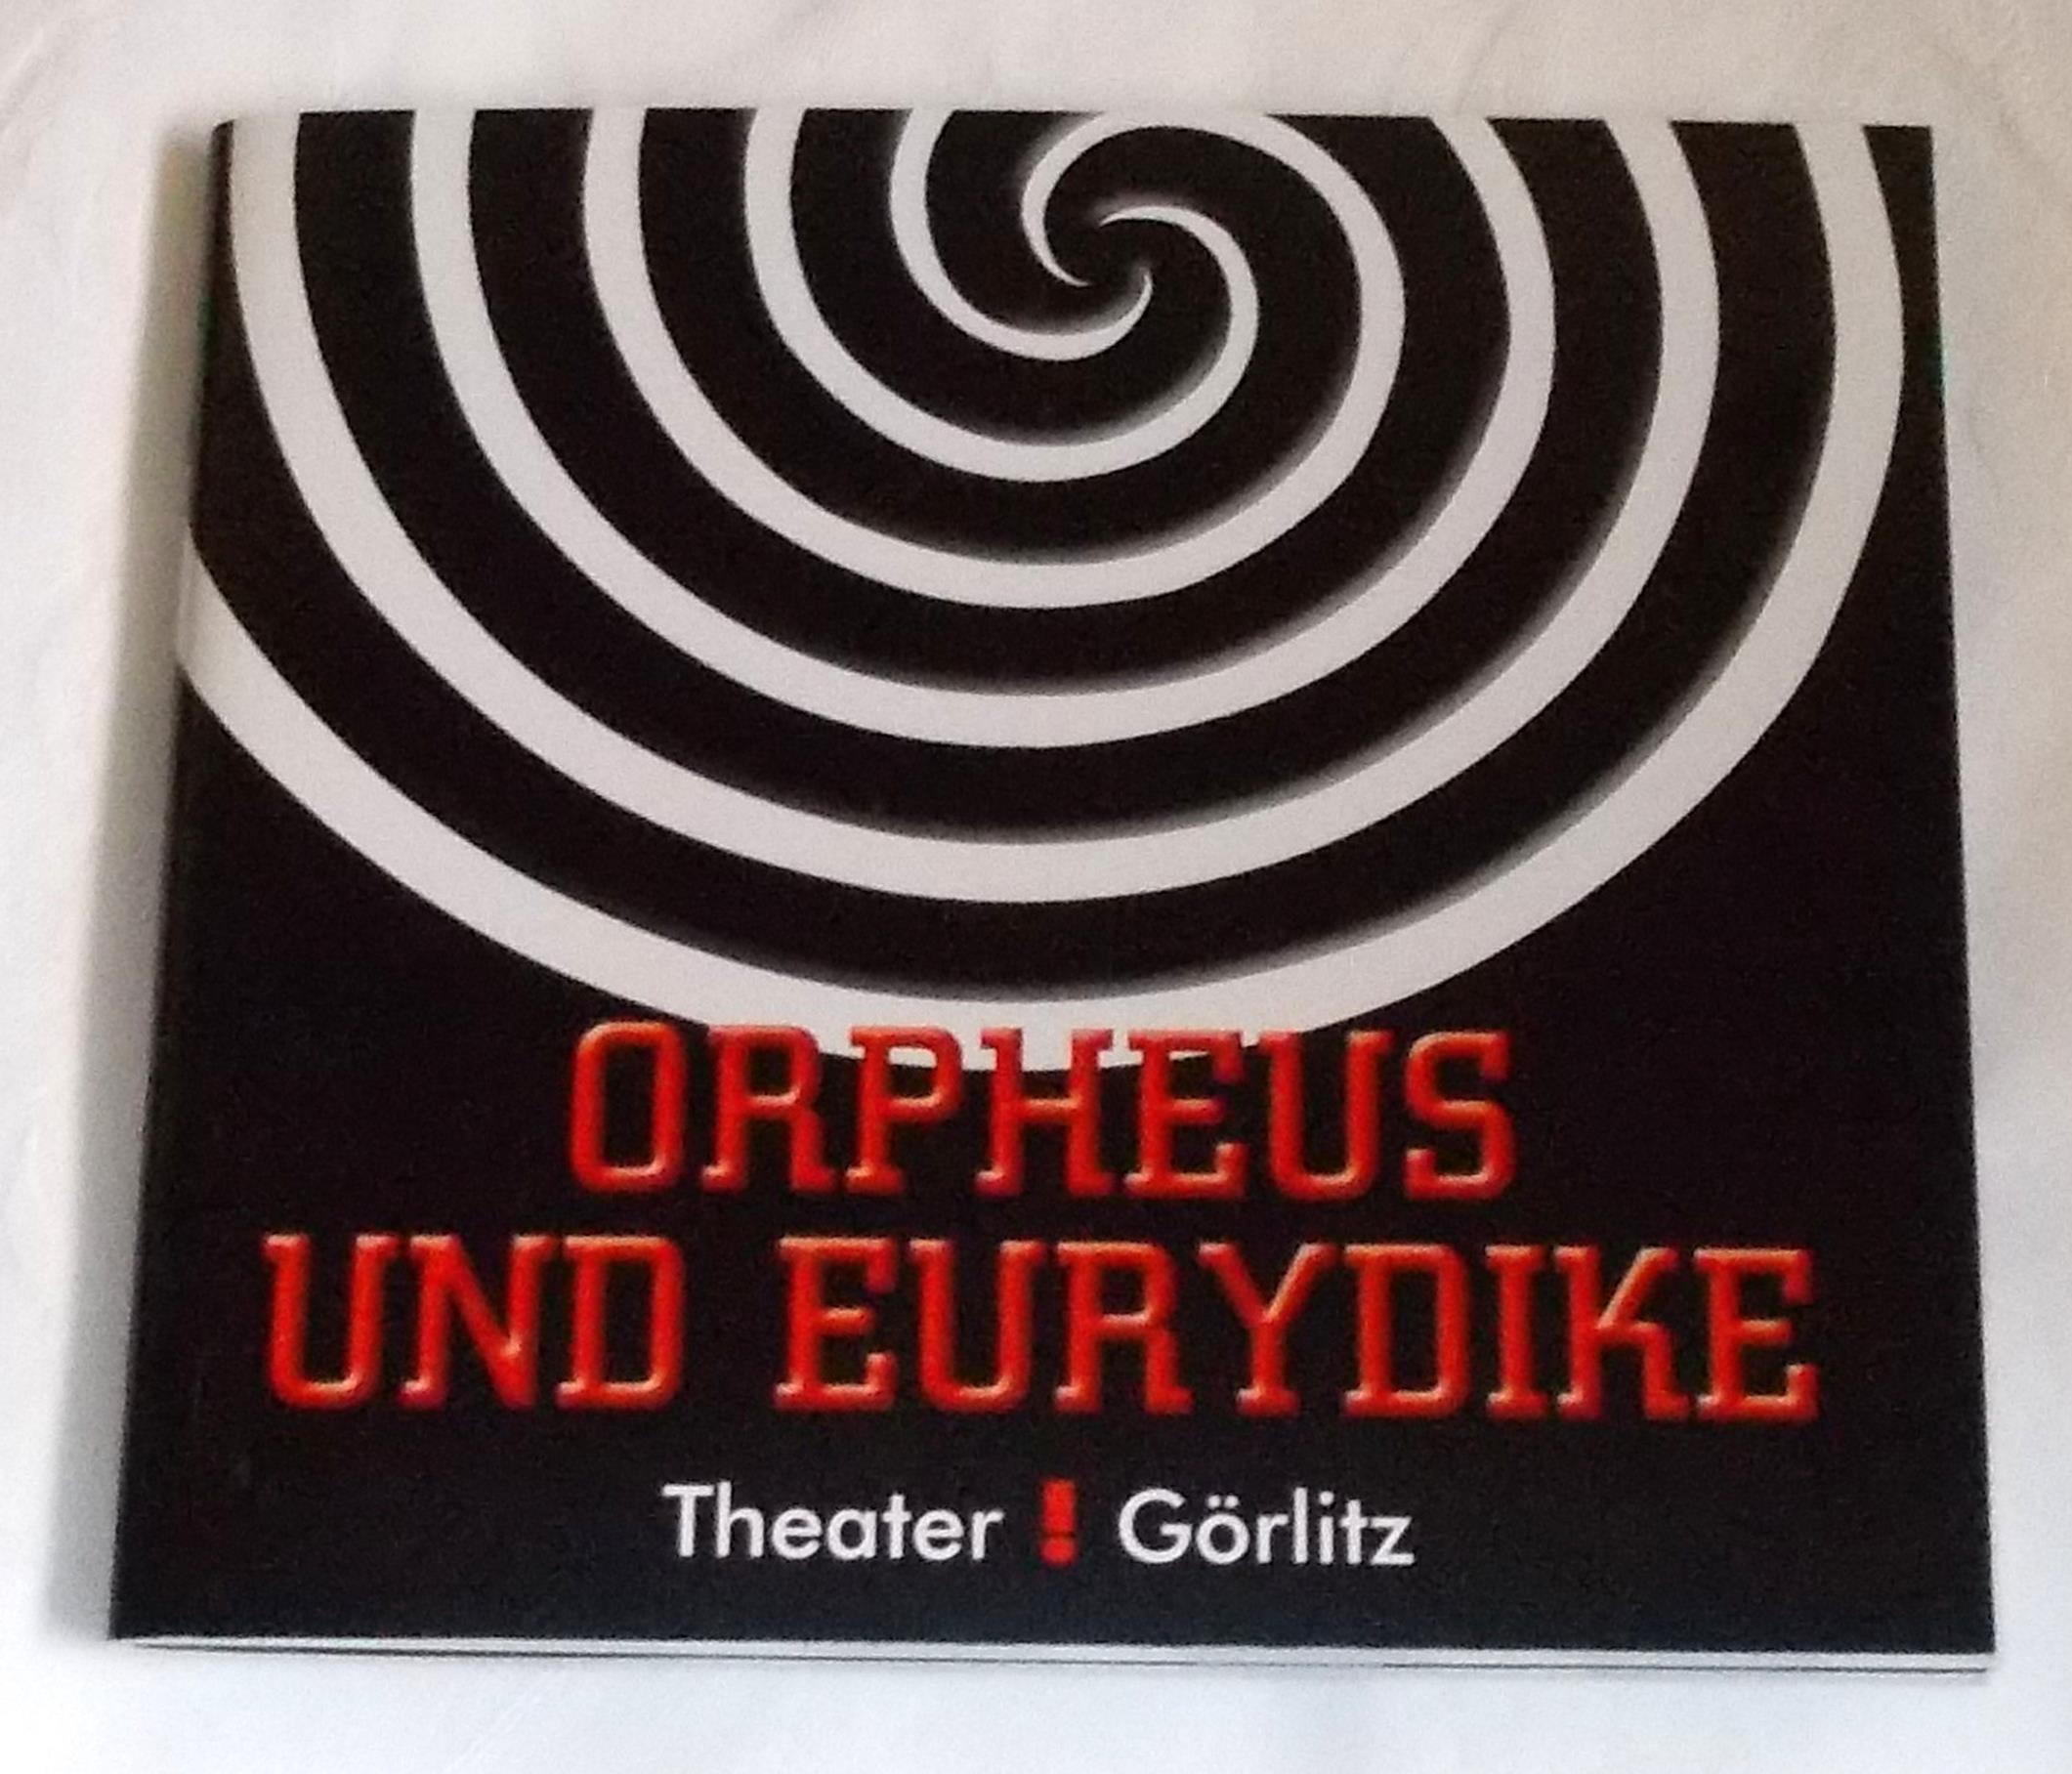 Programmheft ORPHEUS UND EURYDIKE. Gerhart Hauptmann Theater, Görlitz 2010